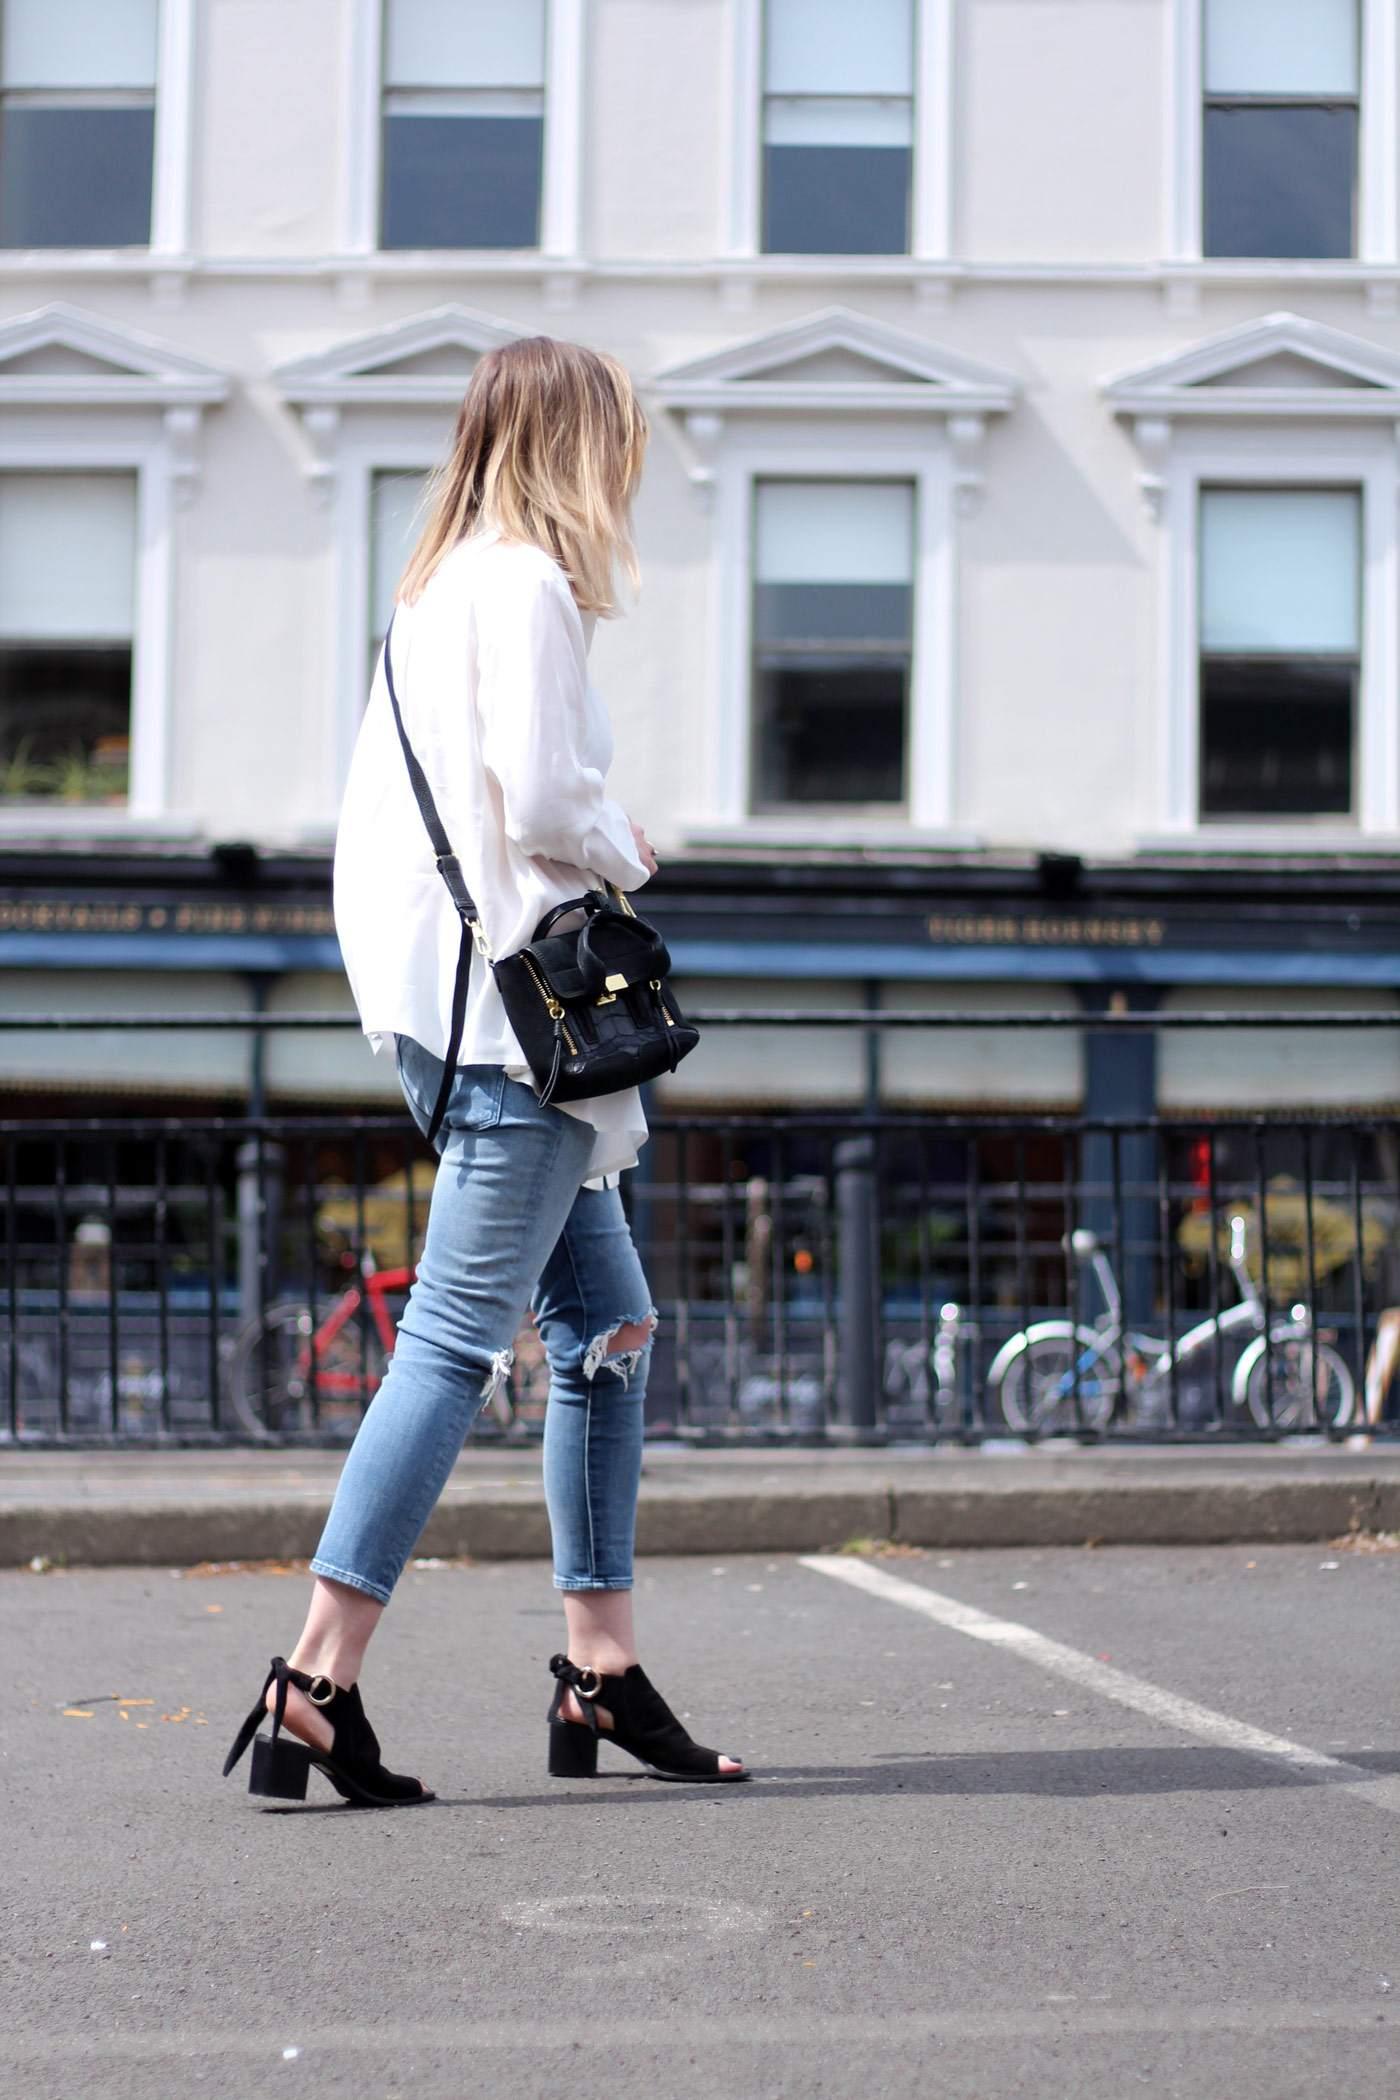 kurt-geiger-suede-peep-toe-boots-7FAM-jeans-COS-white-shirt-phillip-lim-pashli-mini-3